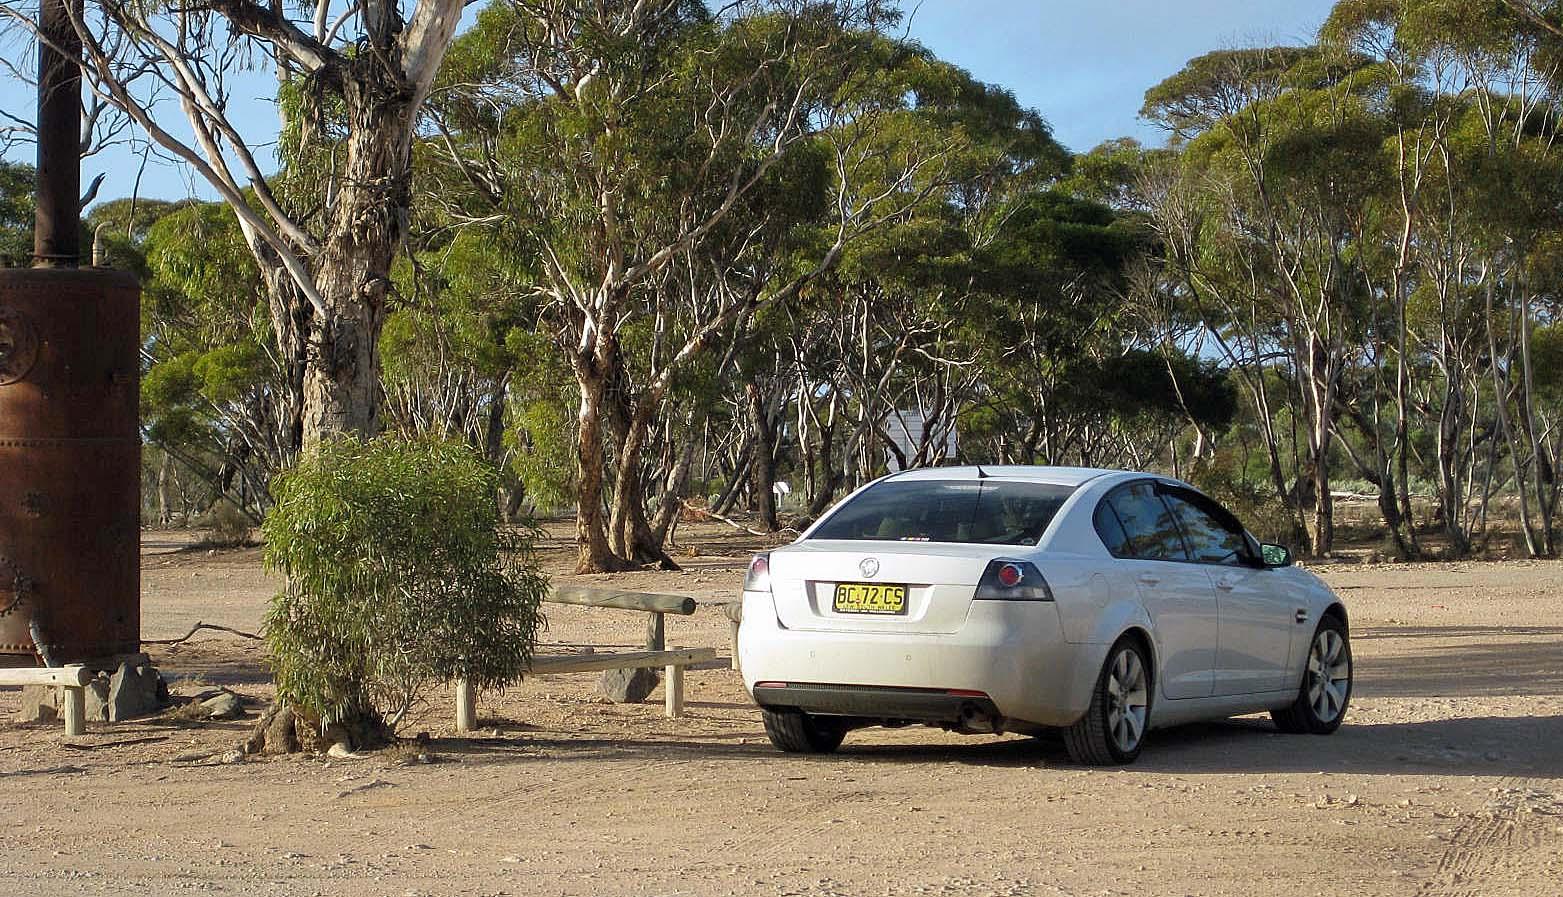 Cav's Blog: Holden Commodore – A Great Australian Car?